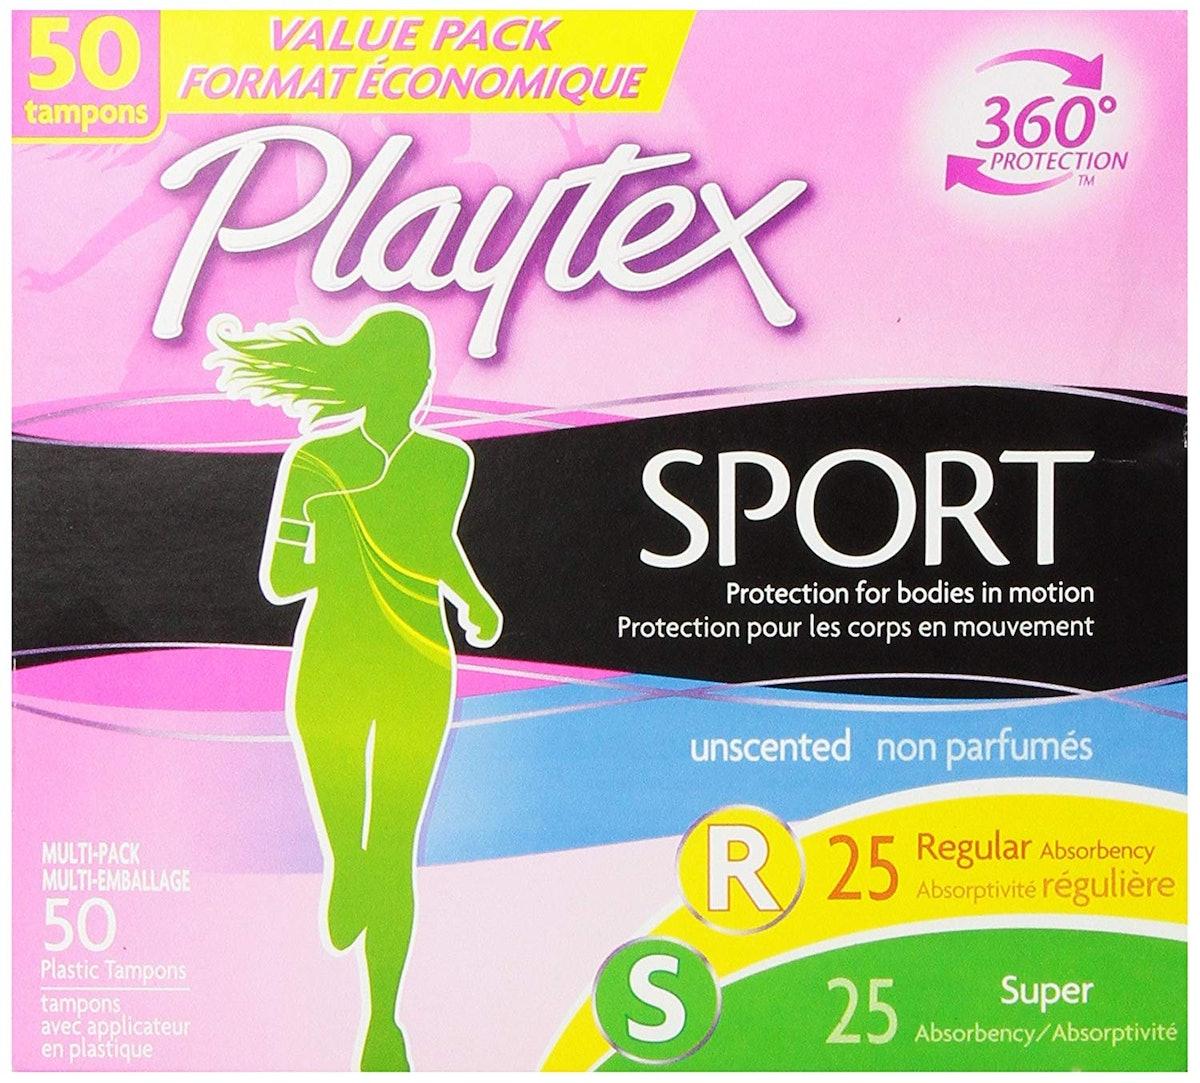 Playtex Sport Tampons, Regular and Super Multi-Pack, 50 Count